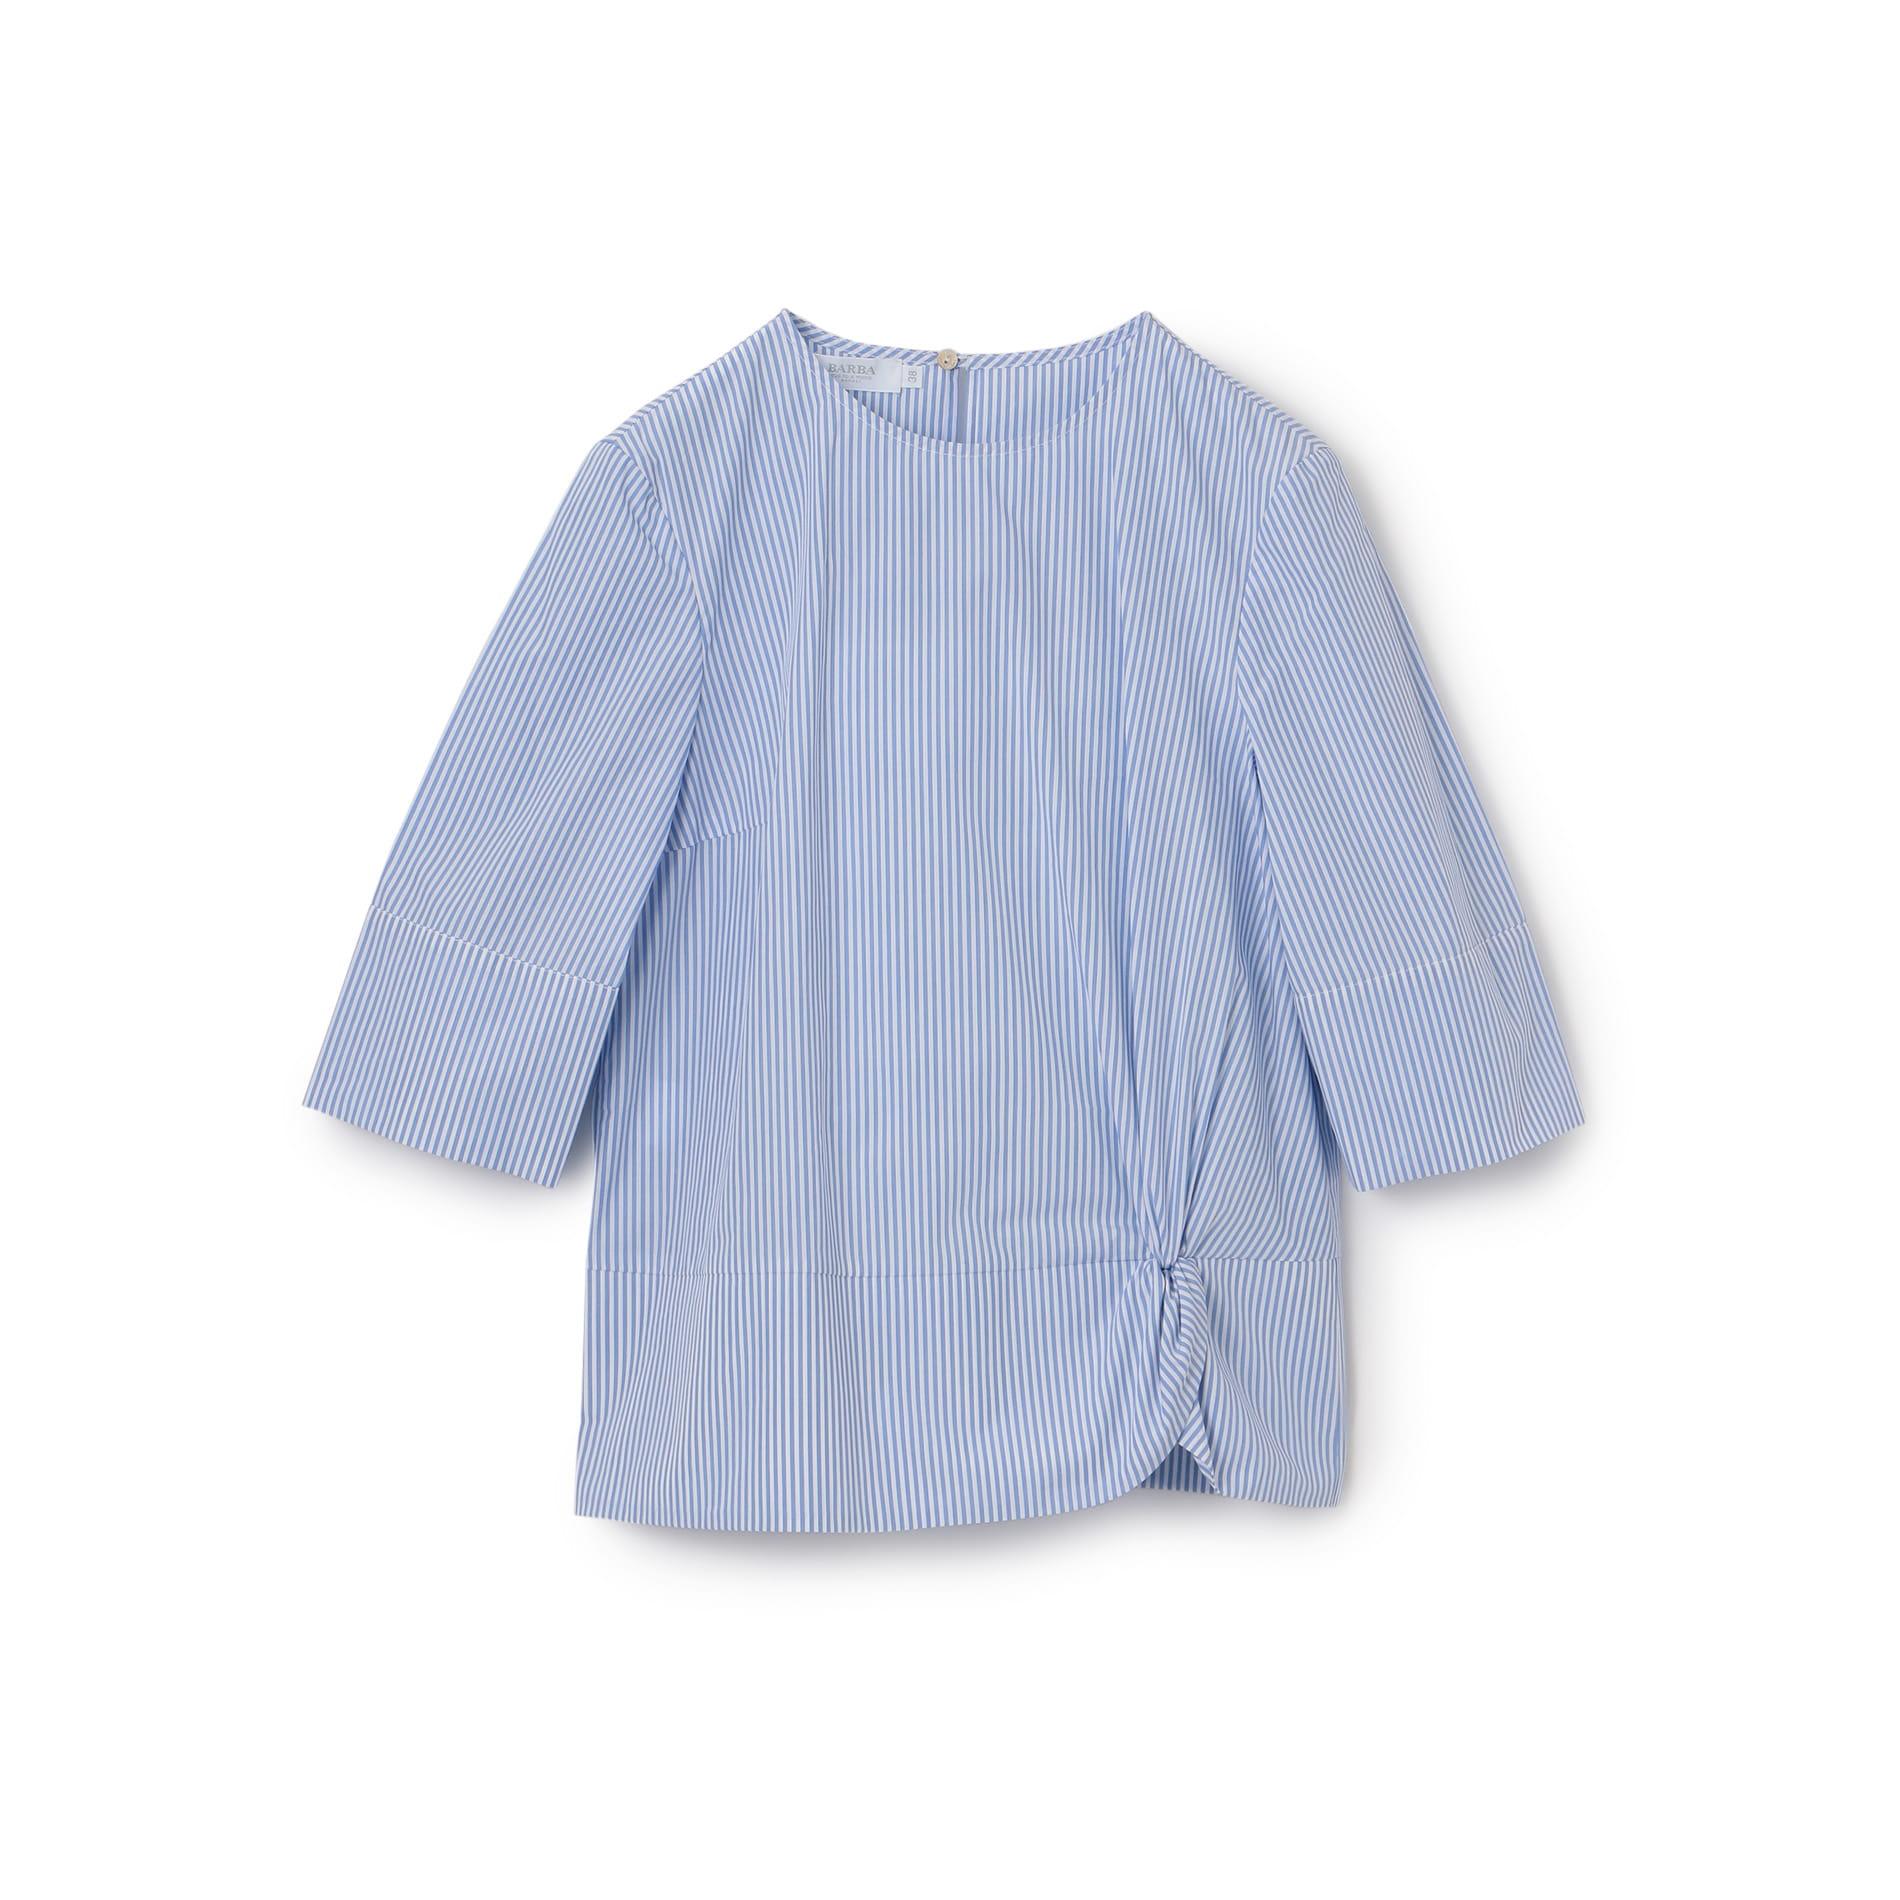 【BARBA】五分袖クルーネックコットンストライプシャツ